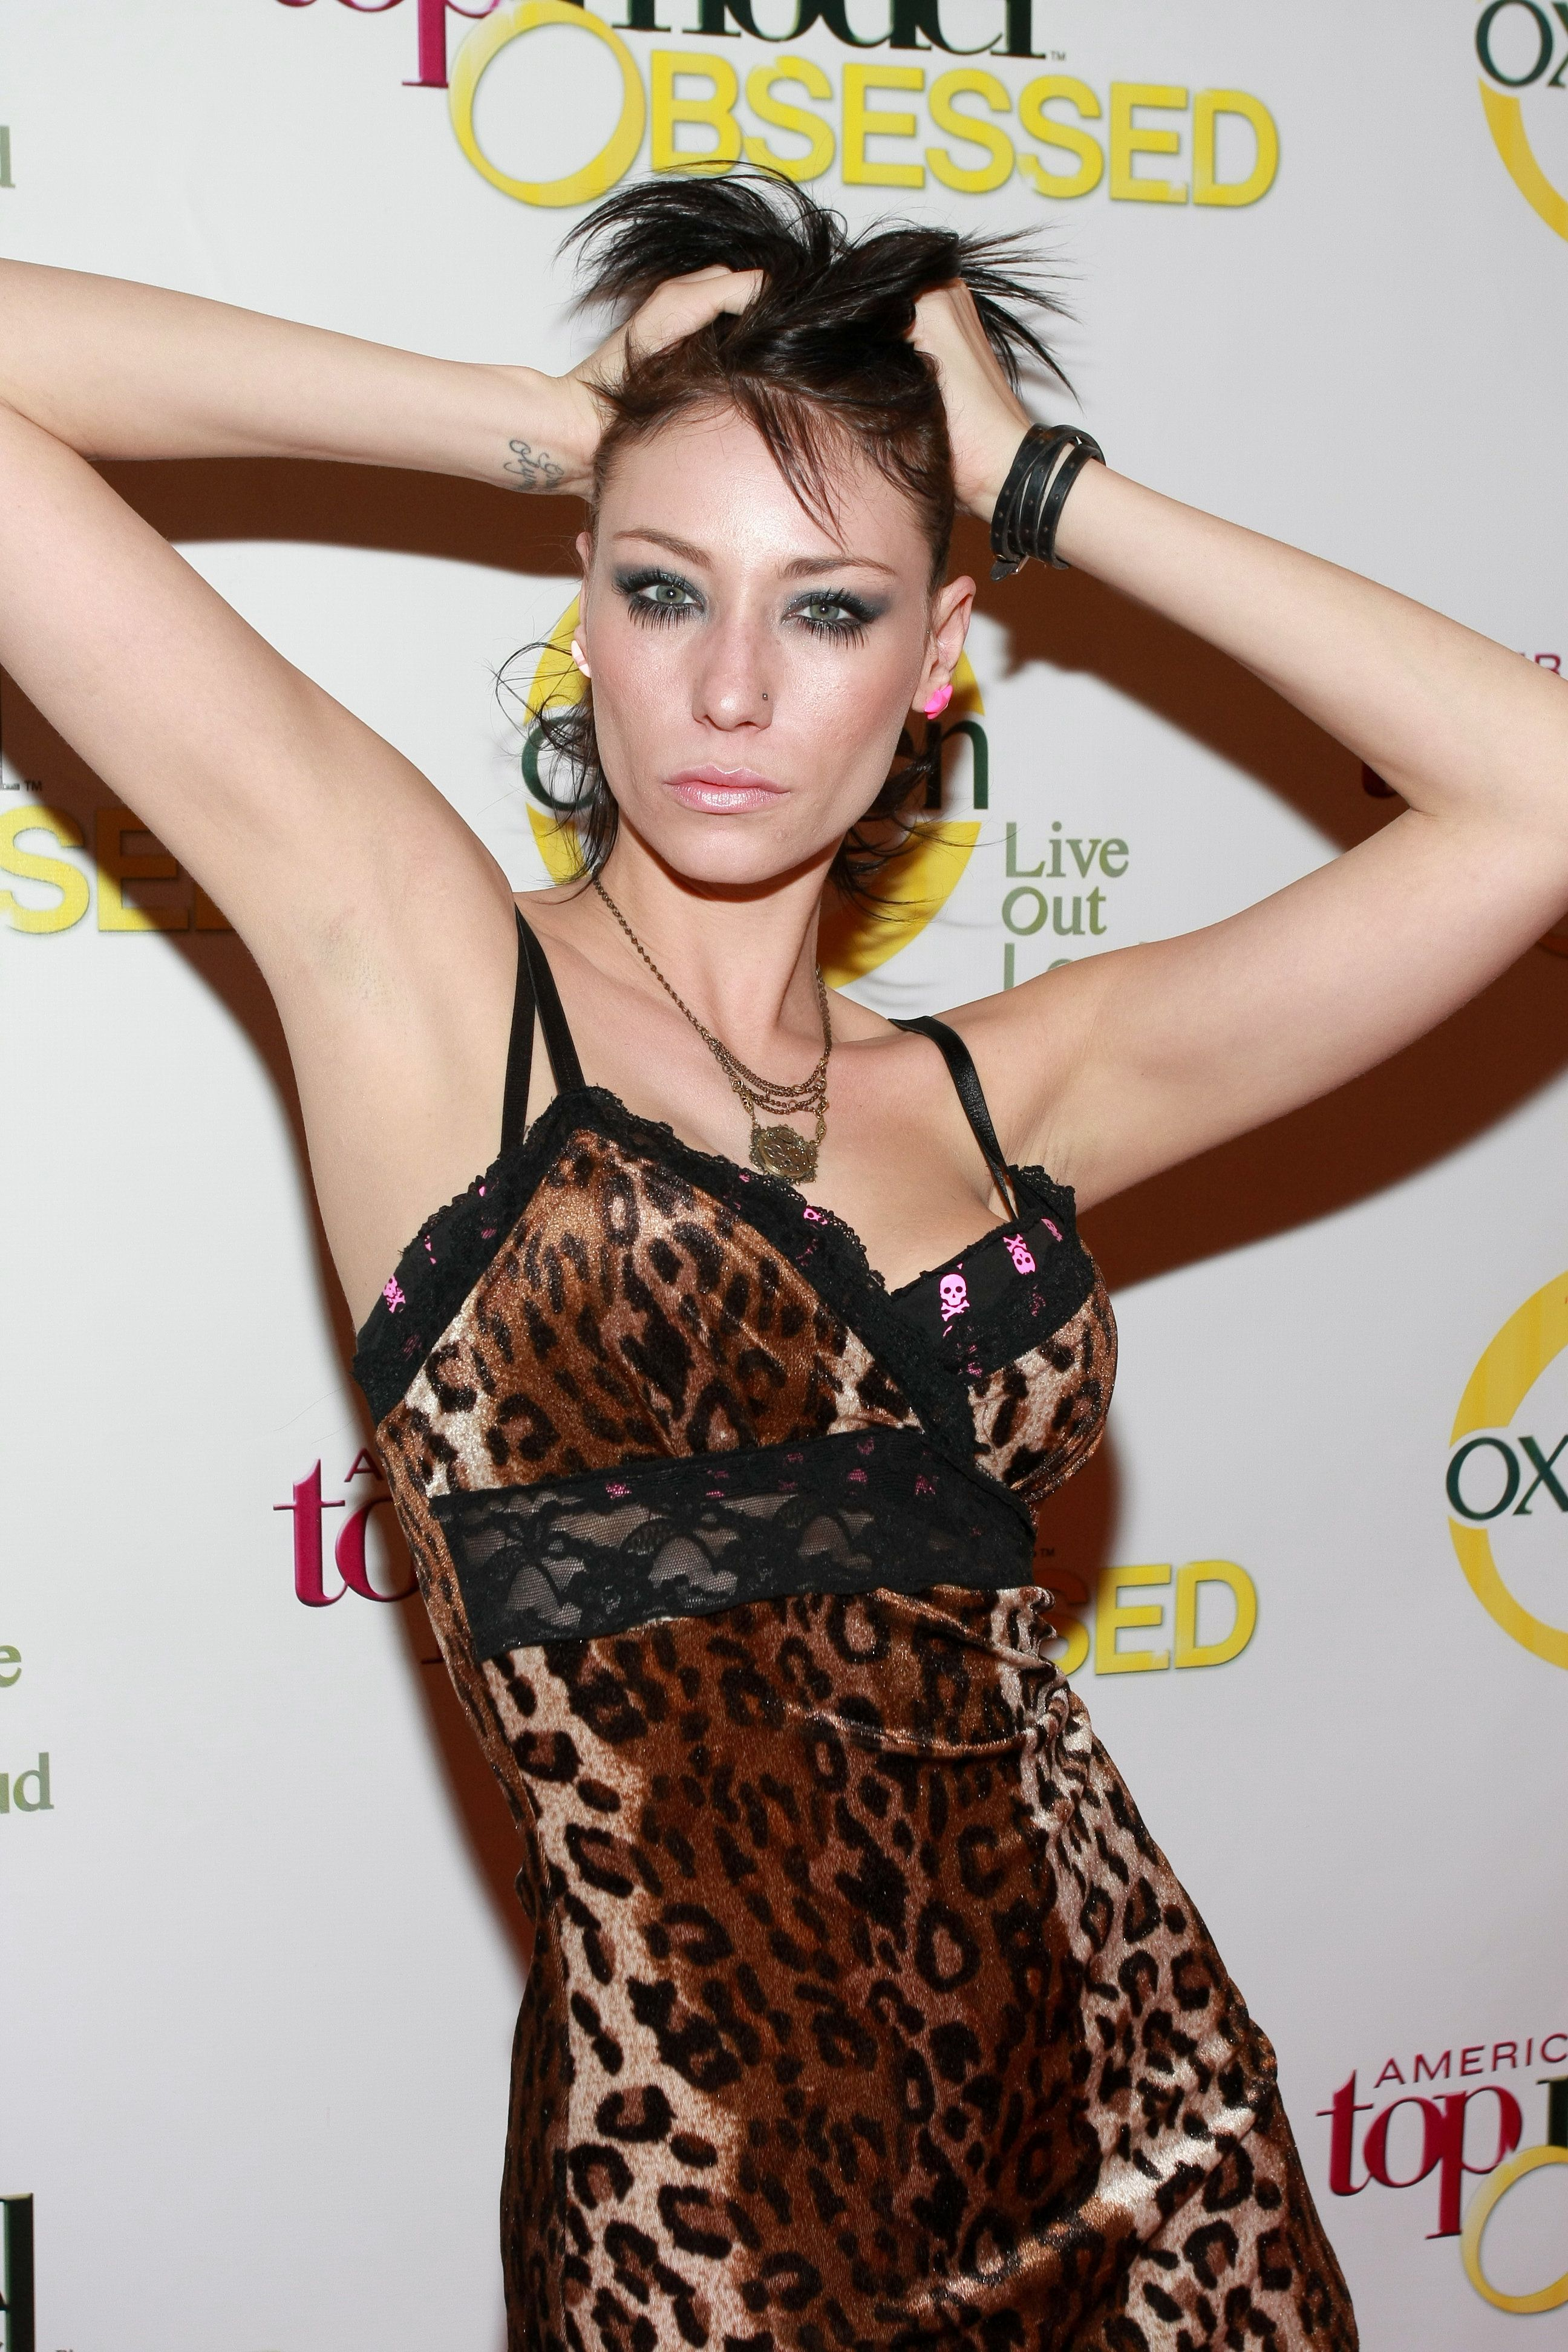 'America's Next Top Model' Star Jael Strauss Dies, Aged